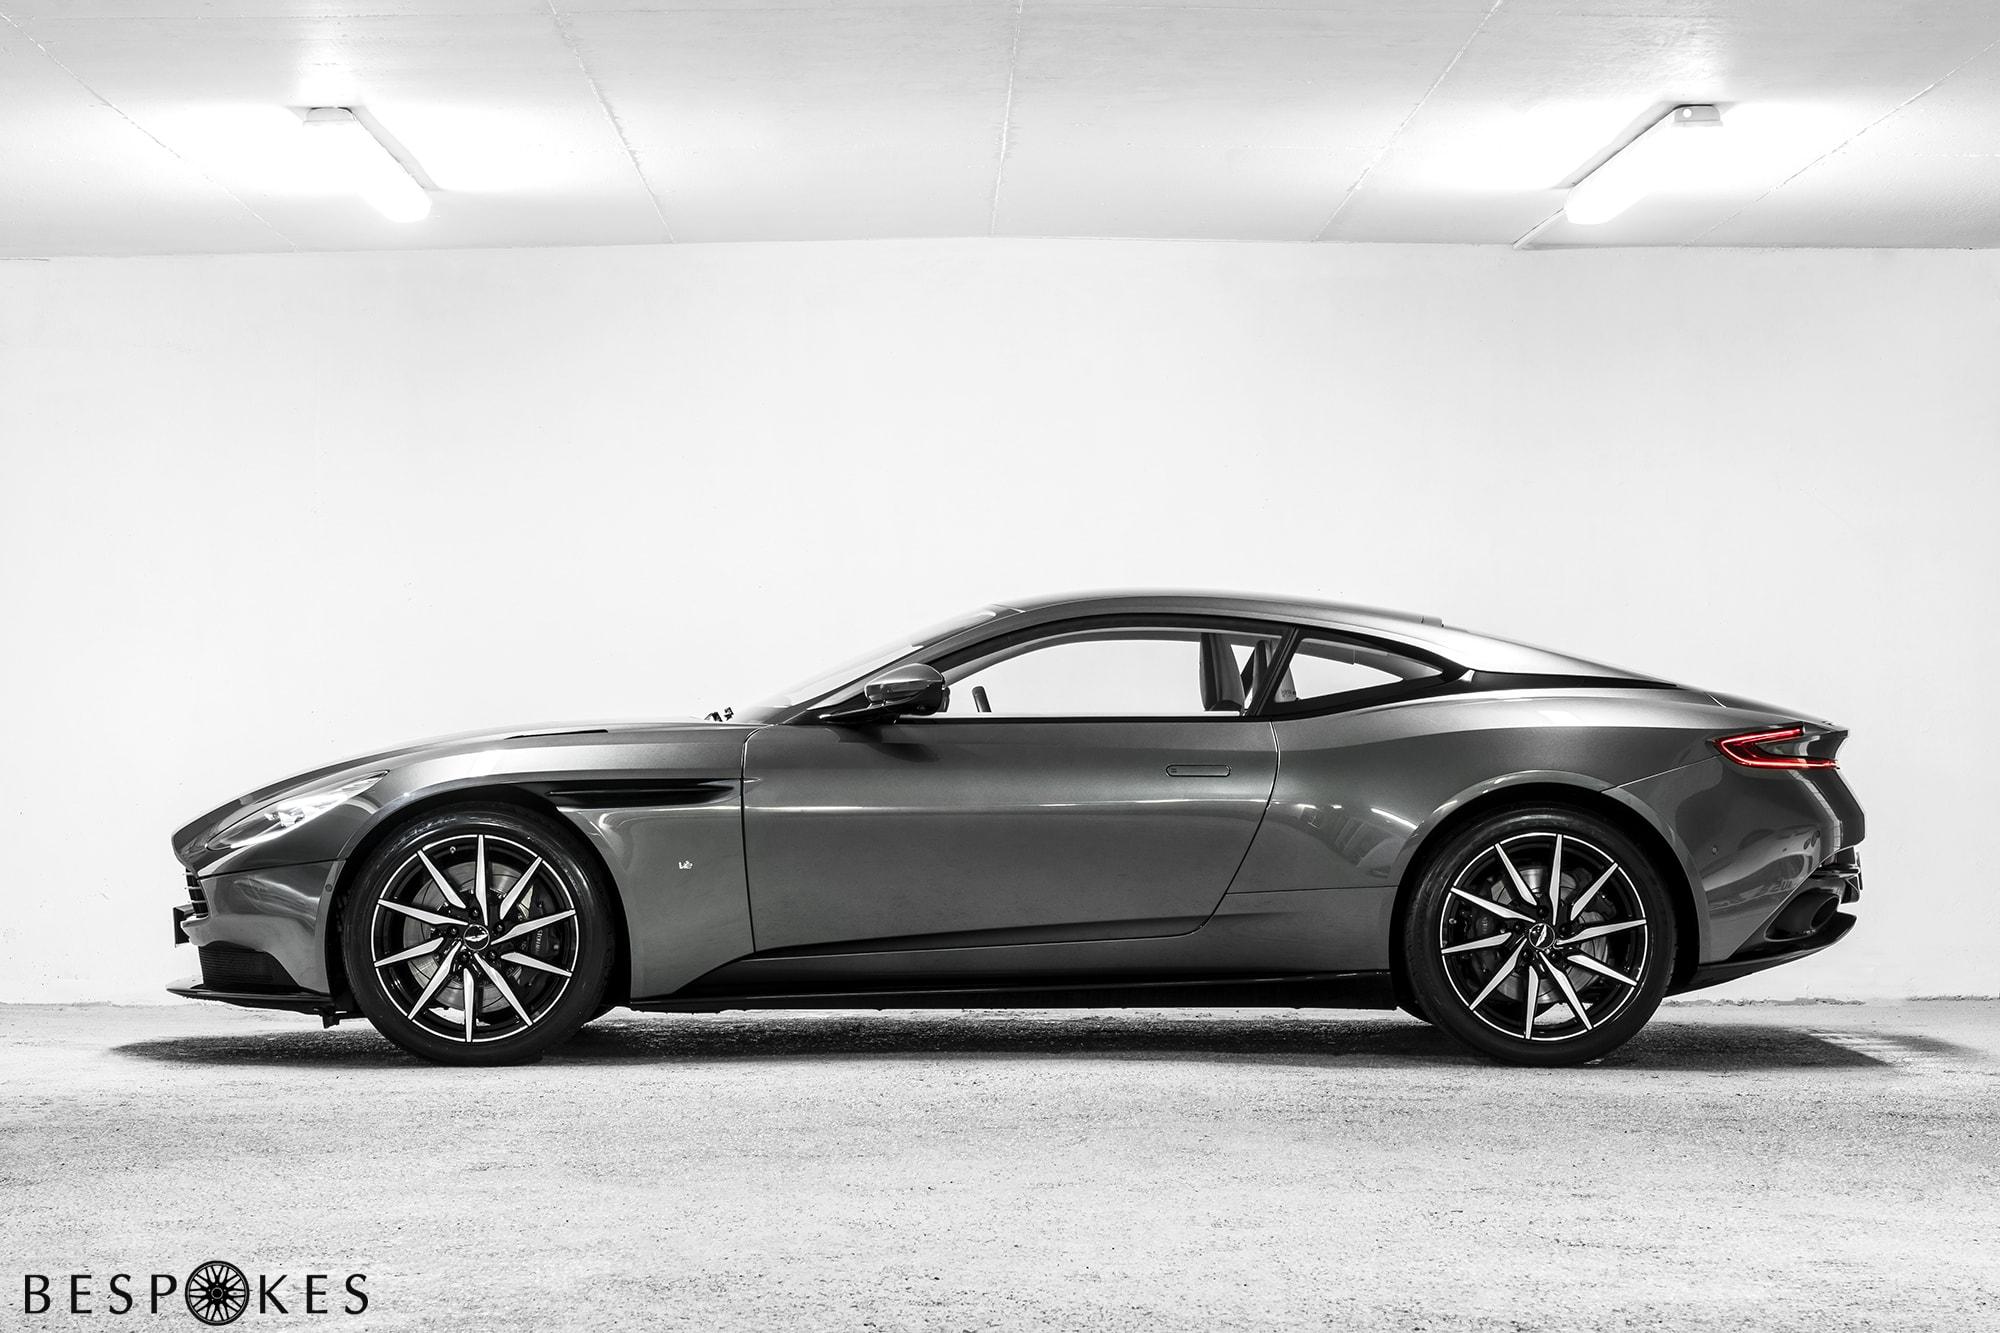 Aston Martin Db11 Bespokes